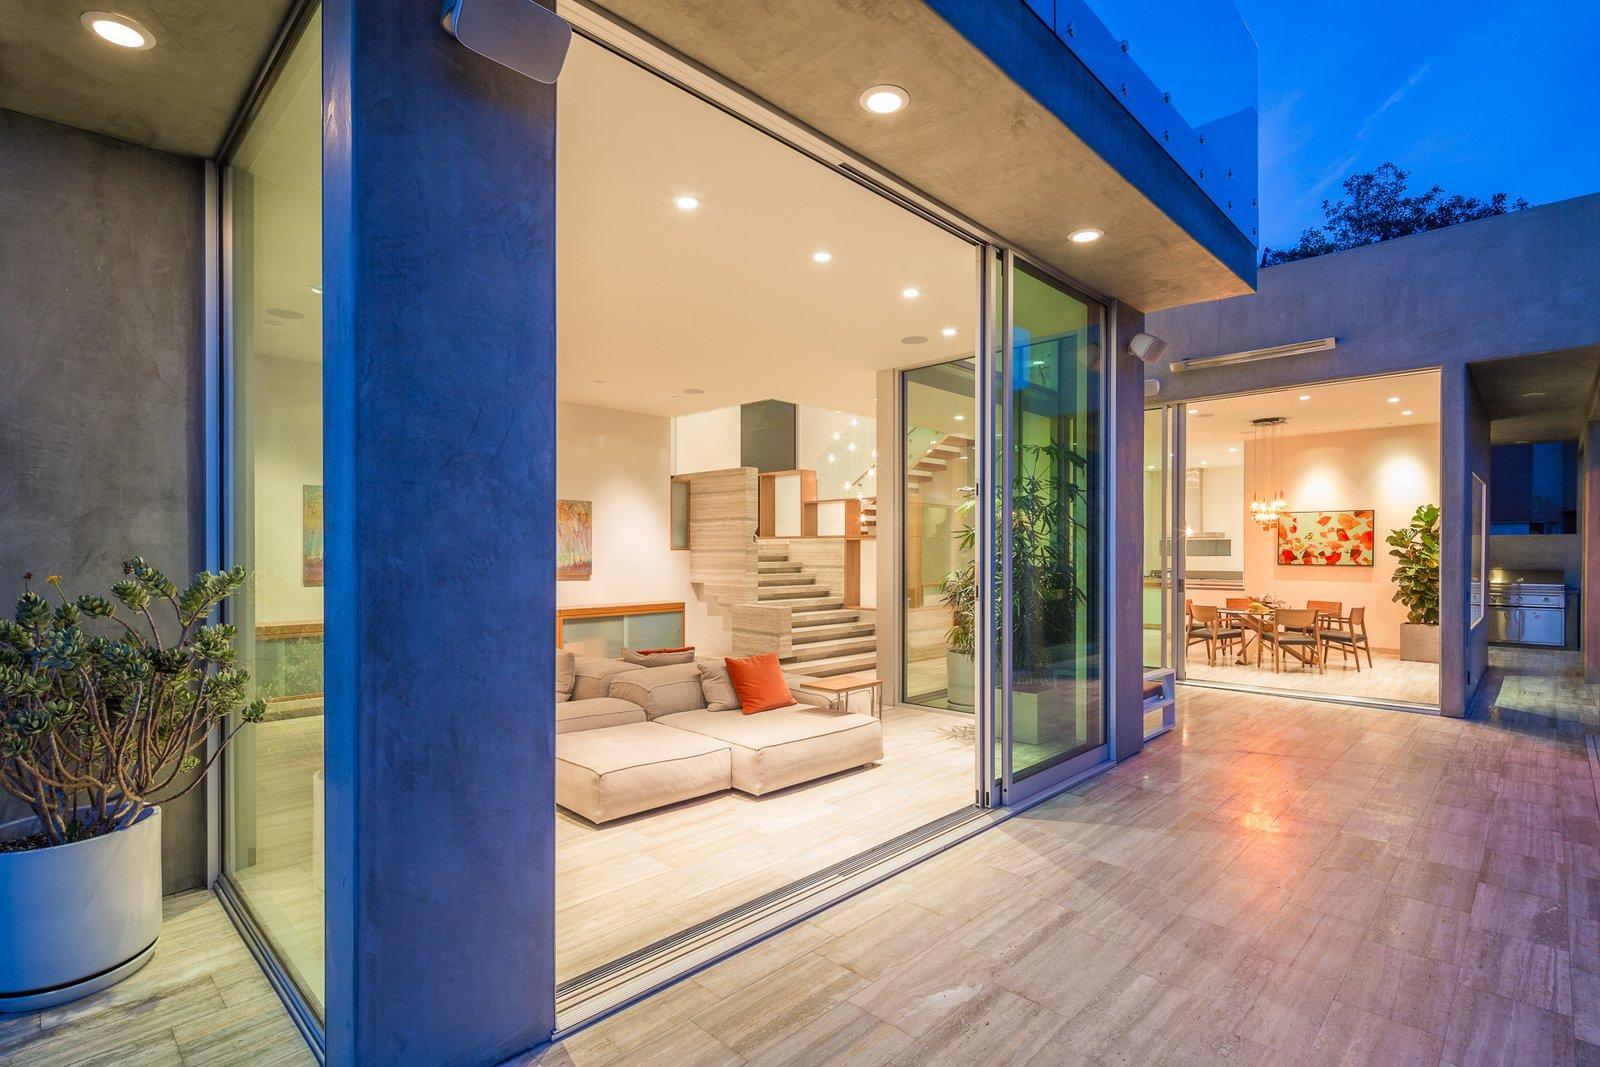 Canyon House by ANX / Aaron Neubert Architects